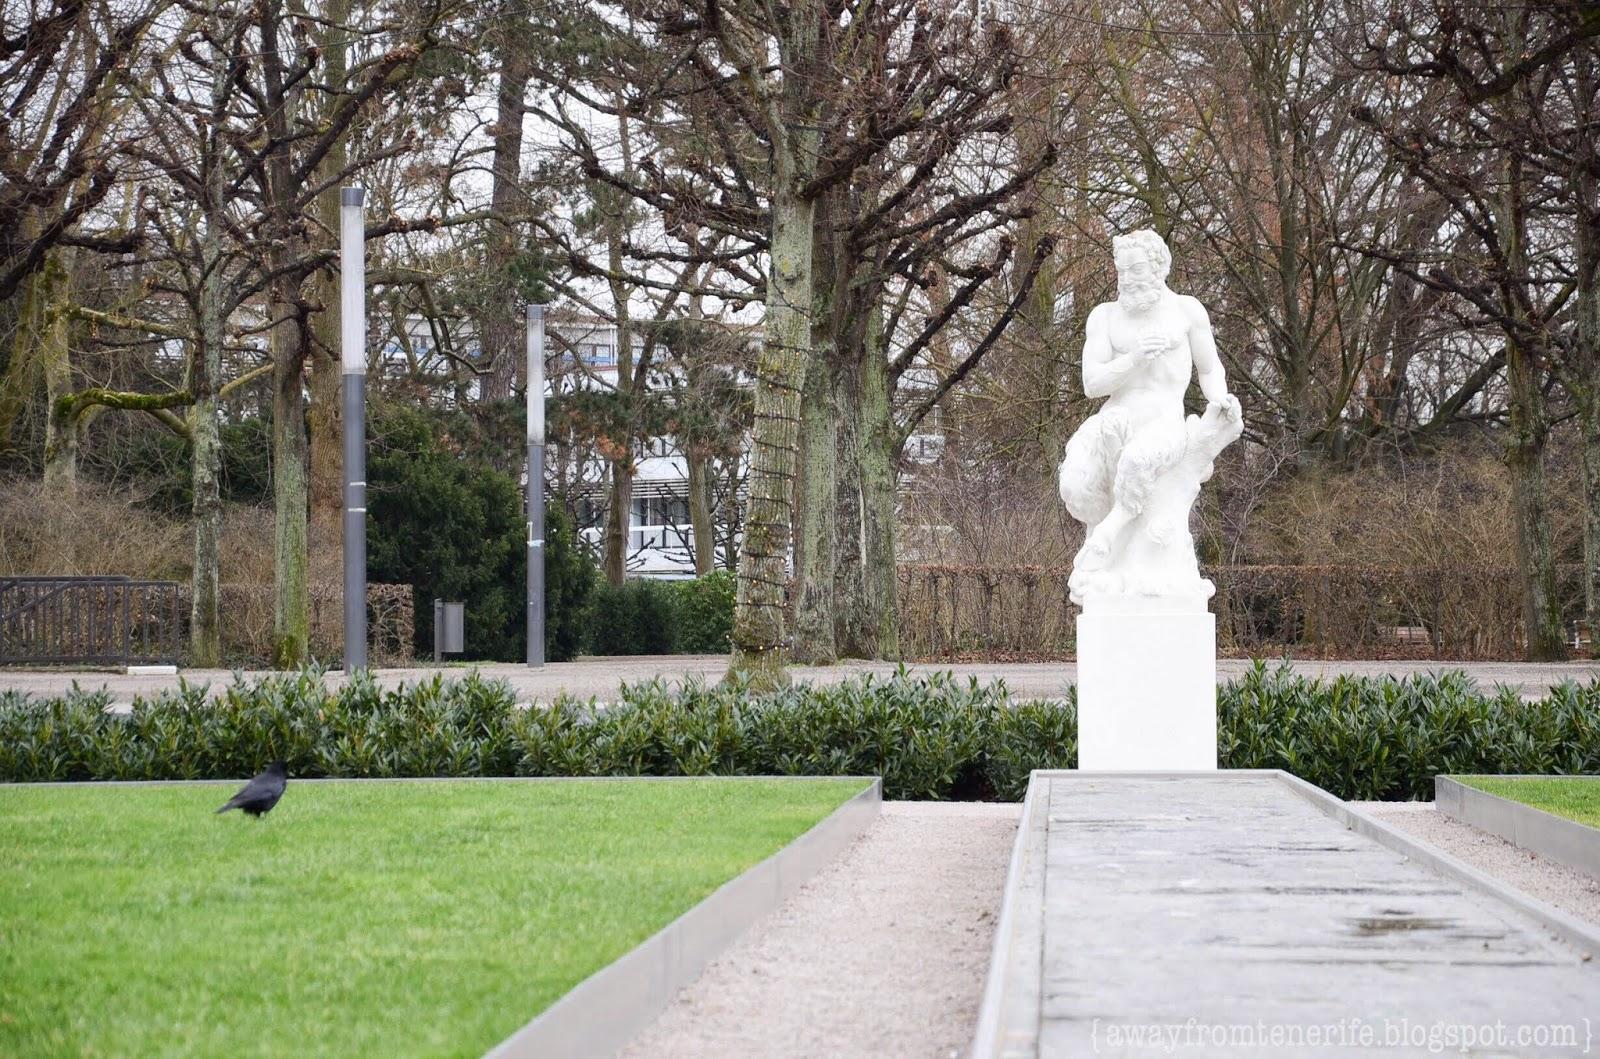 Karlsruhe Schloss gardens